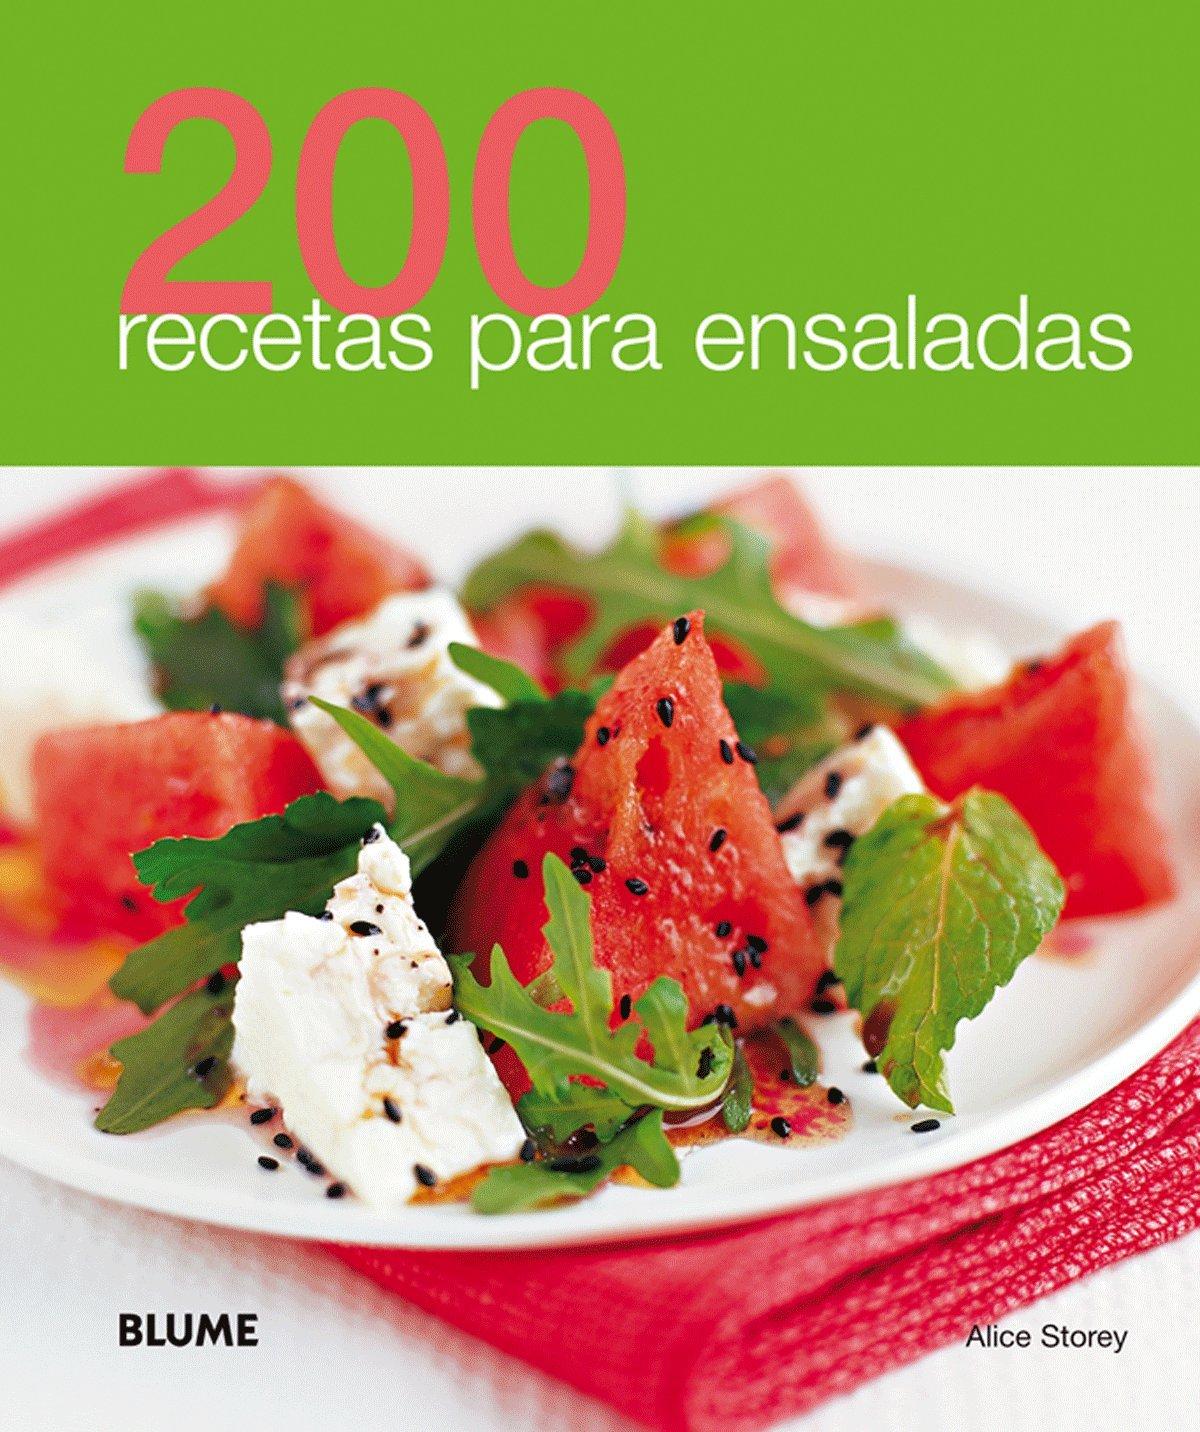 200 recetas para ensaladas (Spanish Edition): Alice Storey: 9788480769020:  Amazon.com: Books